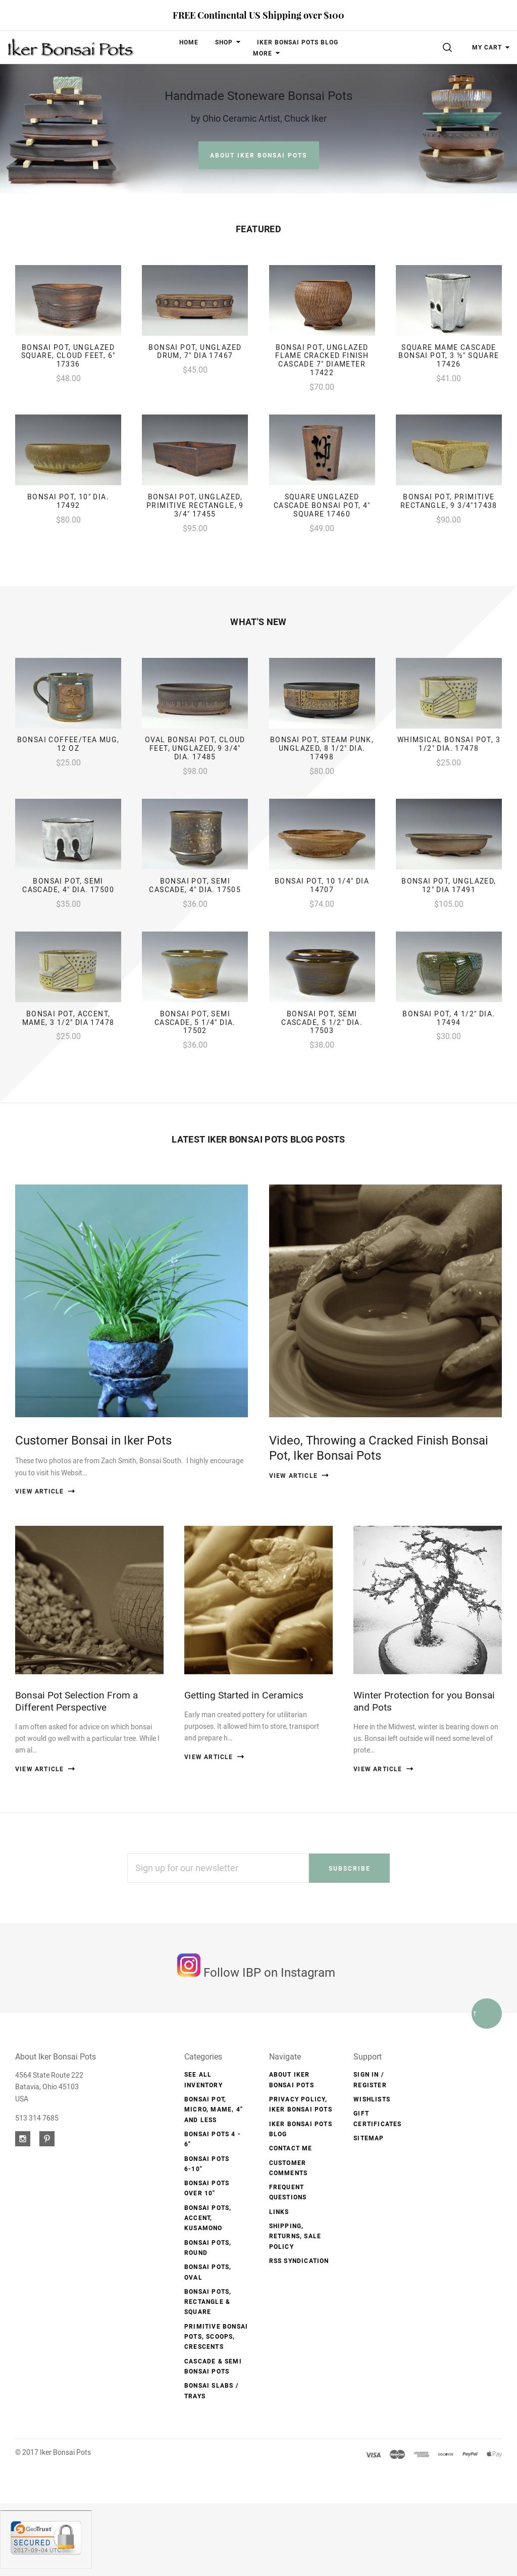 Owler Reports Iker Bonsai Pots Blog Customer Bonsai In Iker Pots